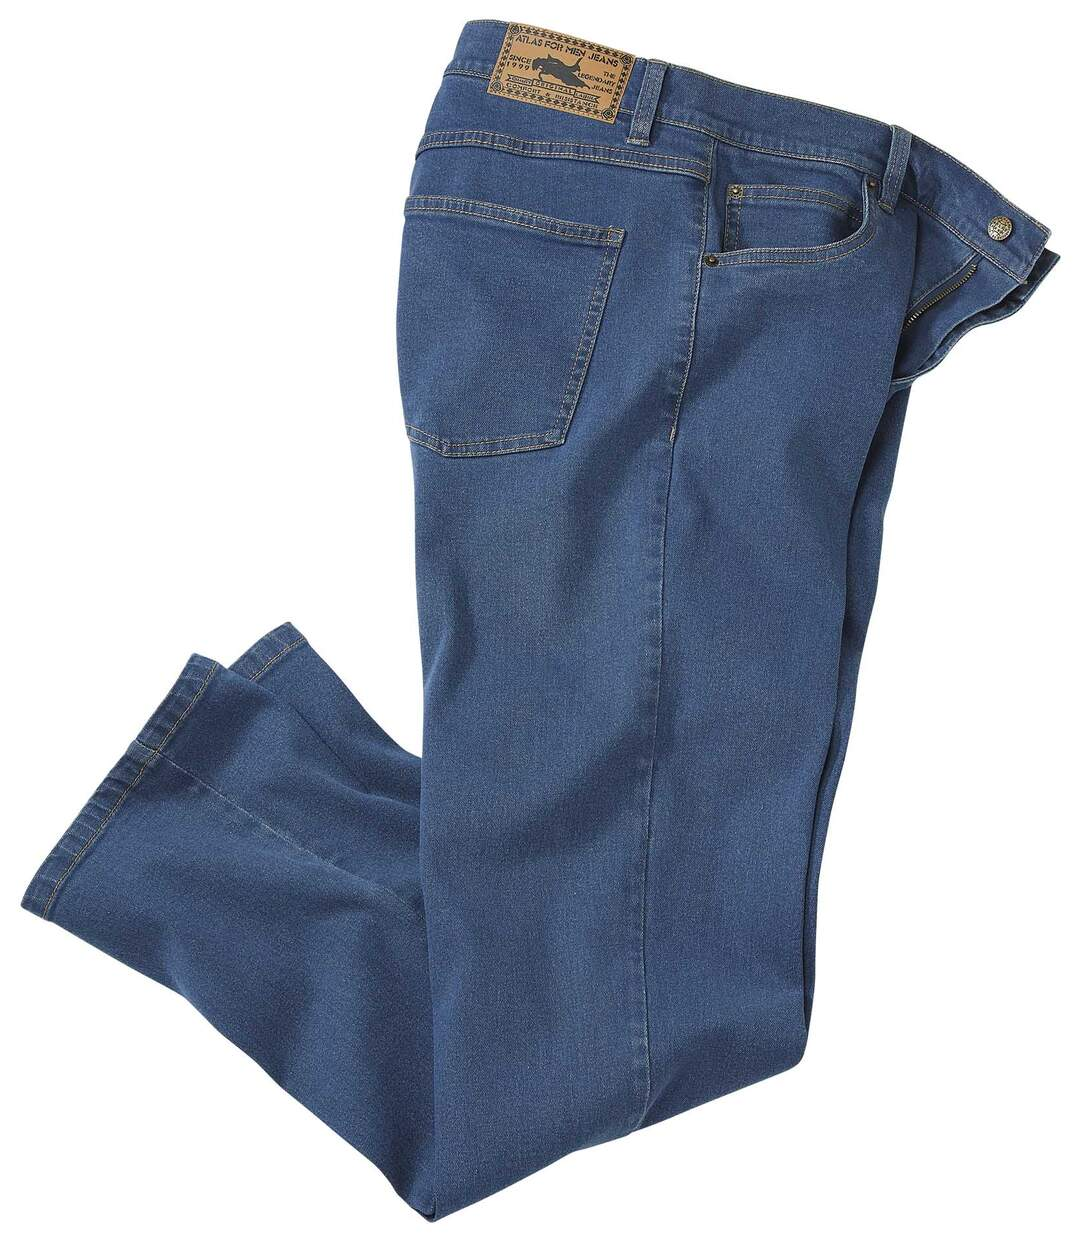 Jeans Stretch Comfort im Regular-Schnitt